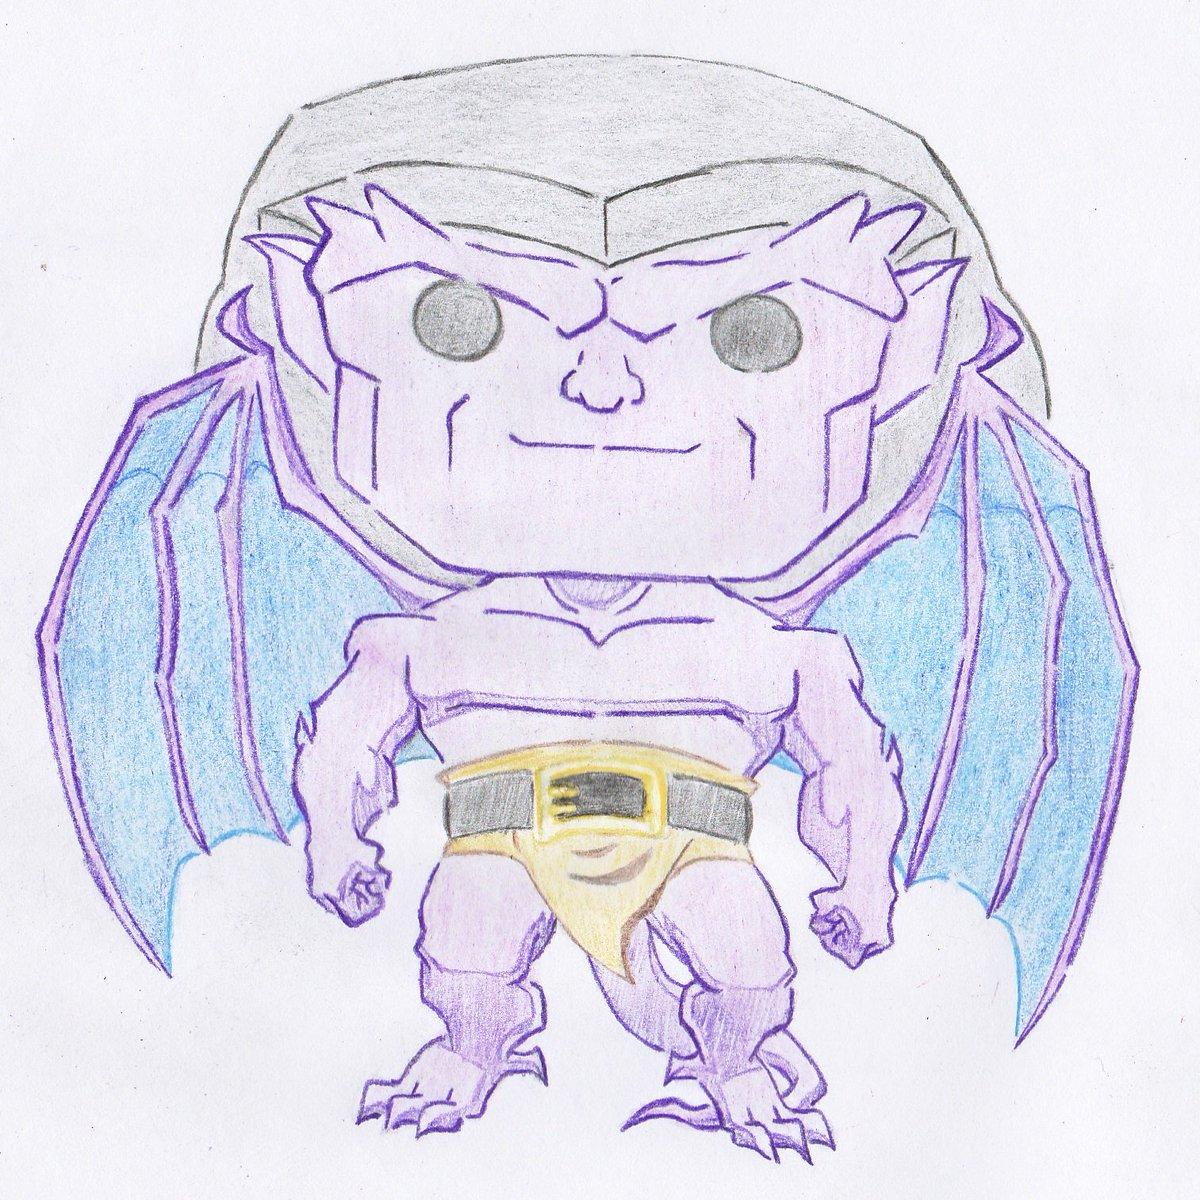 Getting Started #Goliath of #Gargoyles (#Disney) {1994-1997}  https:// alllifeinfate.blogspot.my/2017/07/it-is- nature-of-humankind-to-fear-what.html &nbsp; …  @Disney @OriginalFunko #FunkoPOP #Custom #drawn #sketch<br>http://pic.twitter.com/2yViYj8L9s